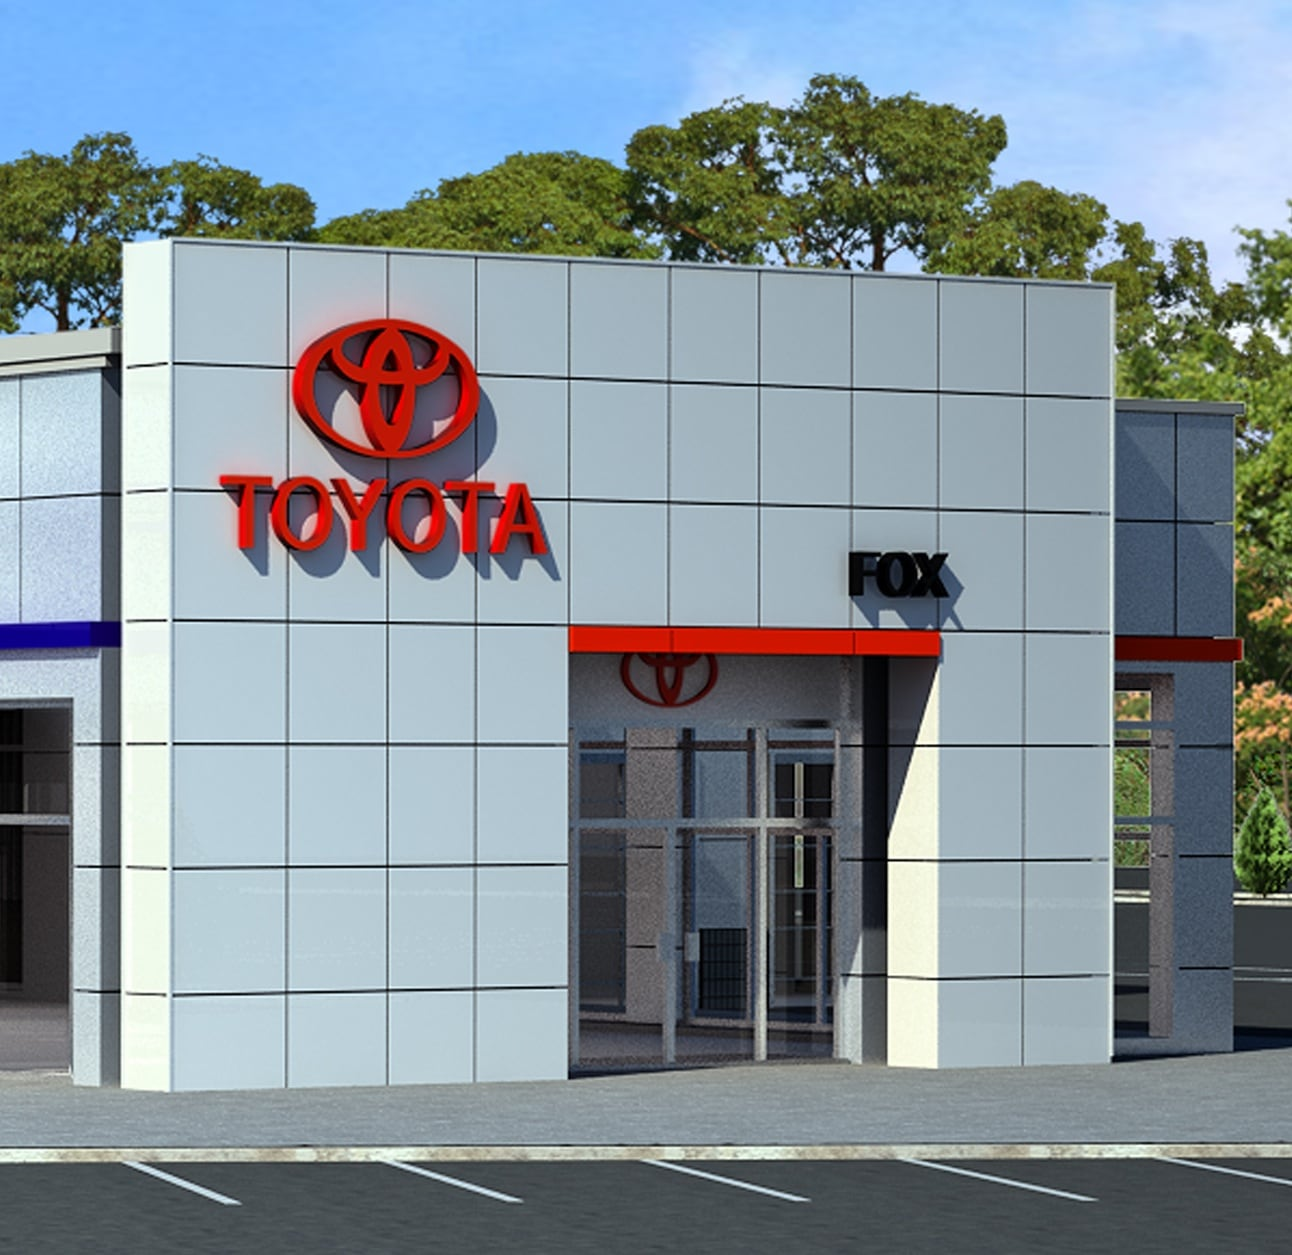 Toyota Dealer Sioux Falls: New Toyota Dealership In Auburn, NY 13021